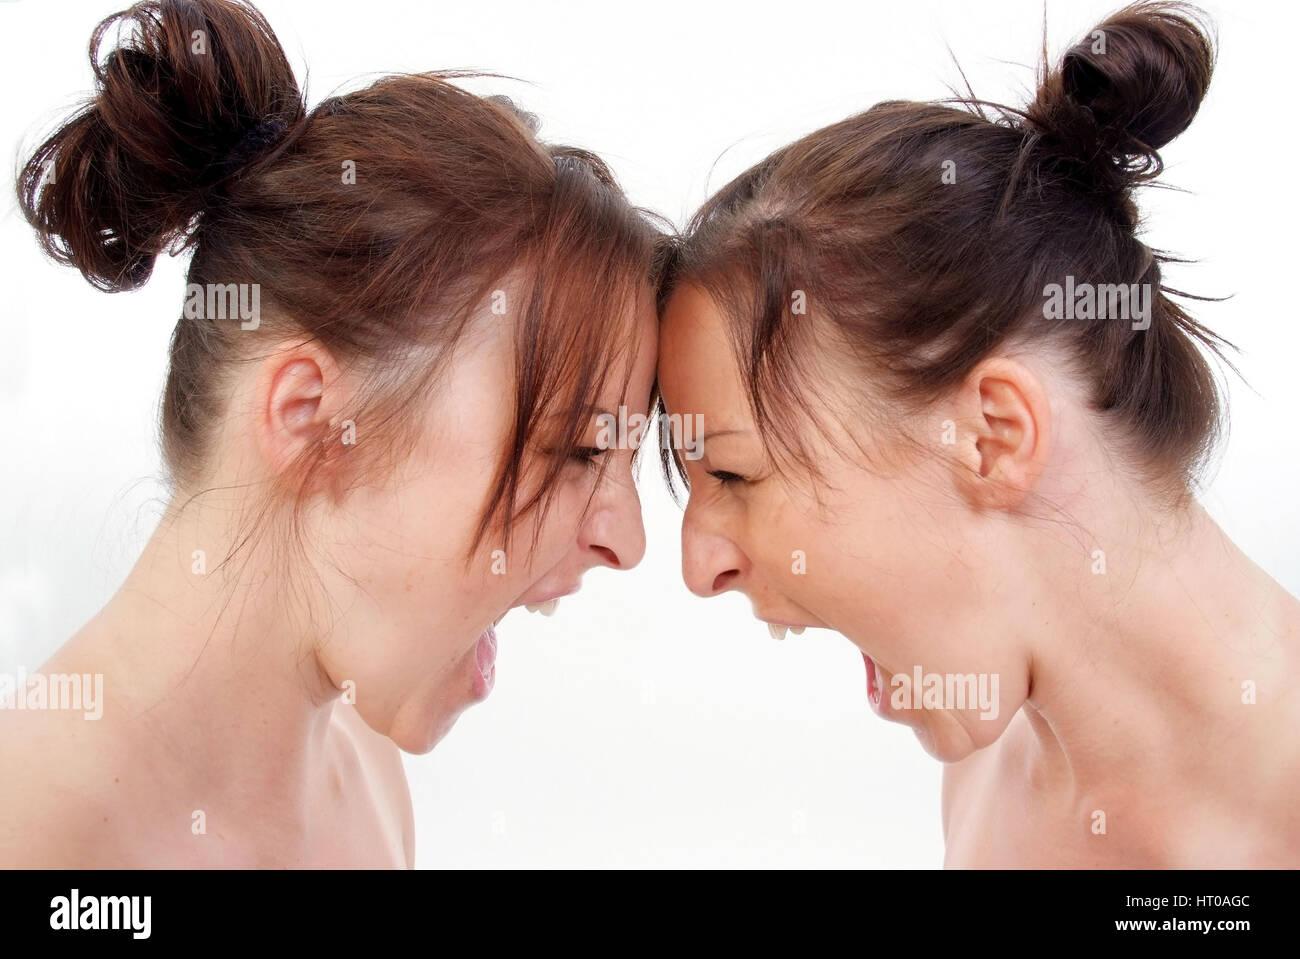 Zwillinge schreien sich an - twins screaming each other Stock Photo